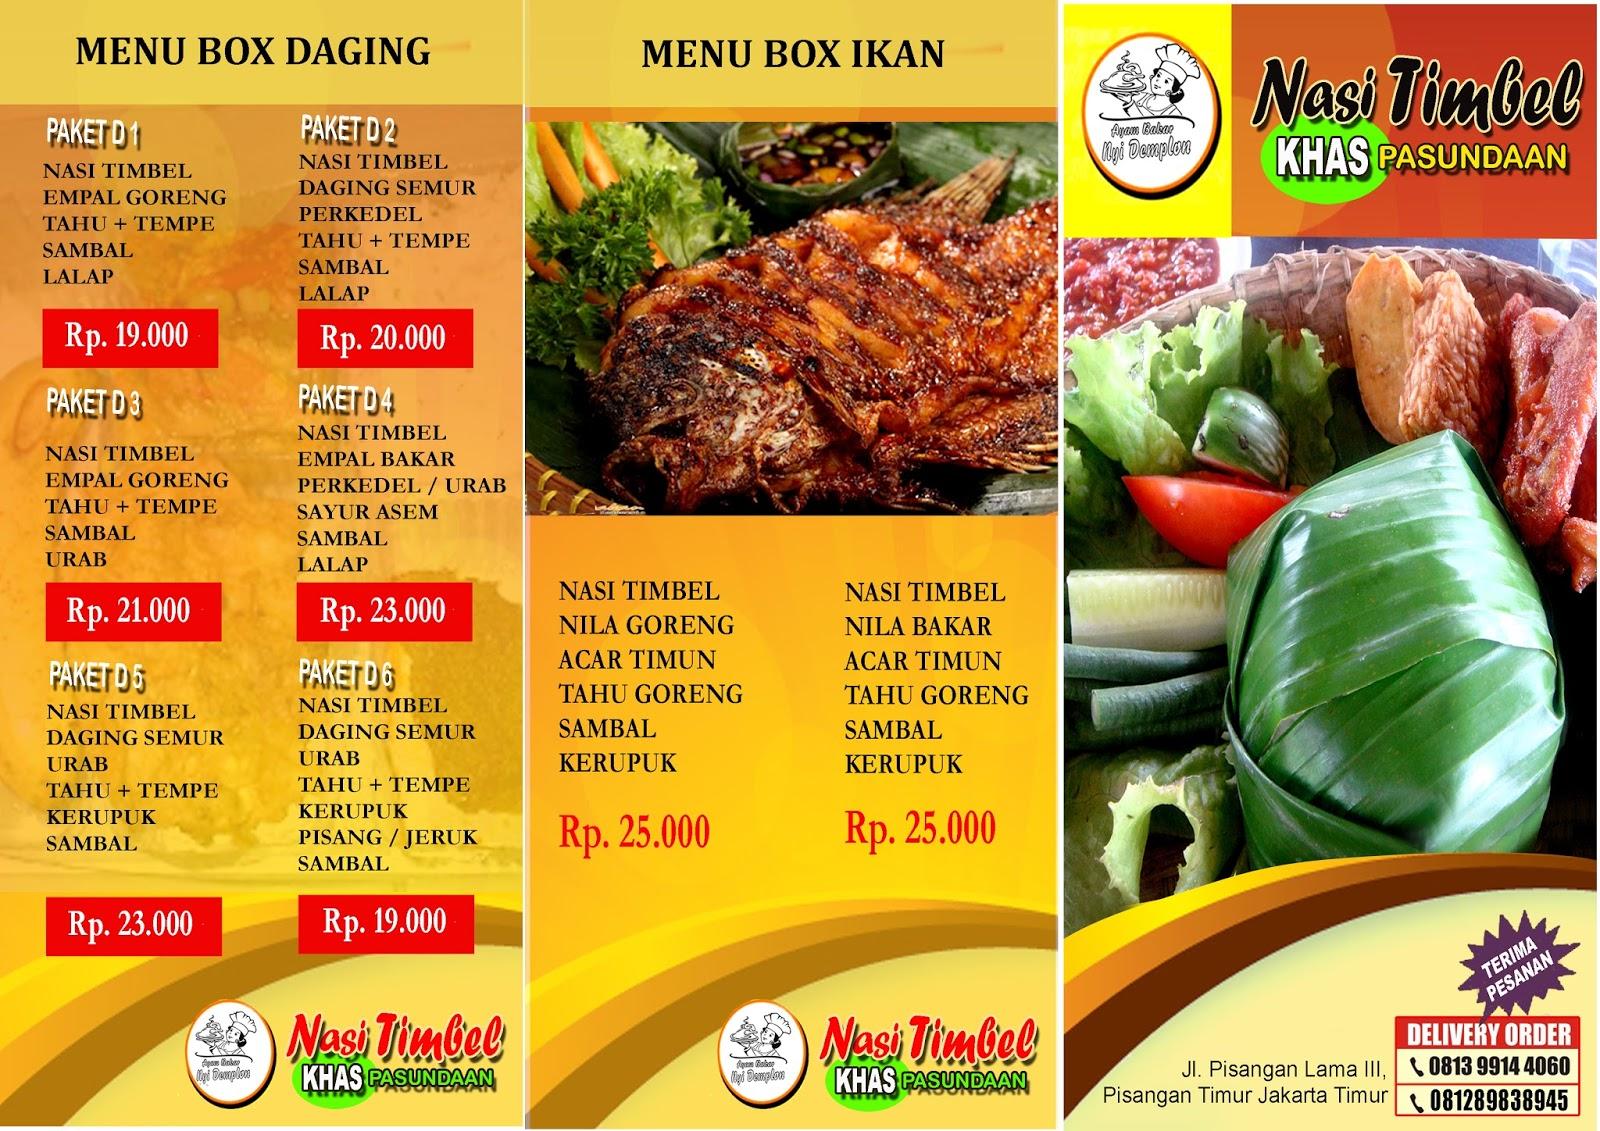 Brosur Makanan Nasi Timbel Fauzi Chaniago